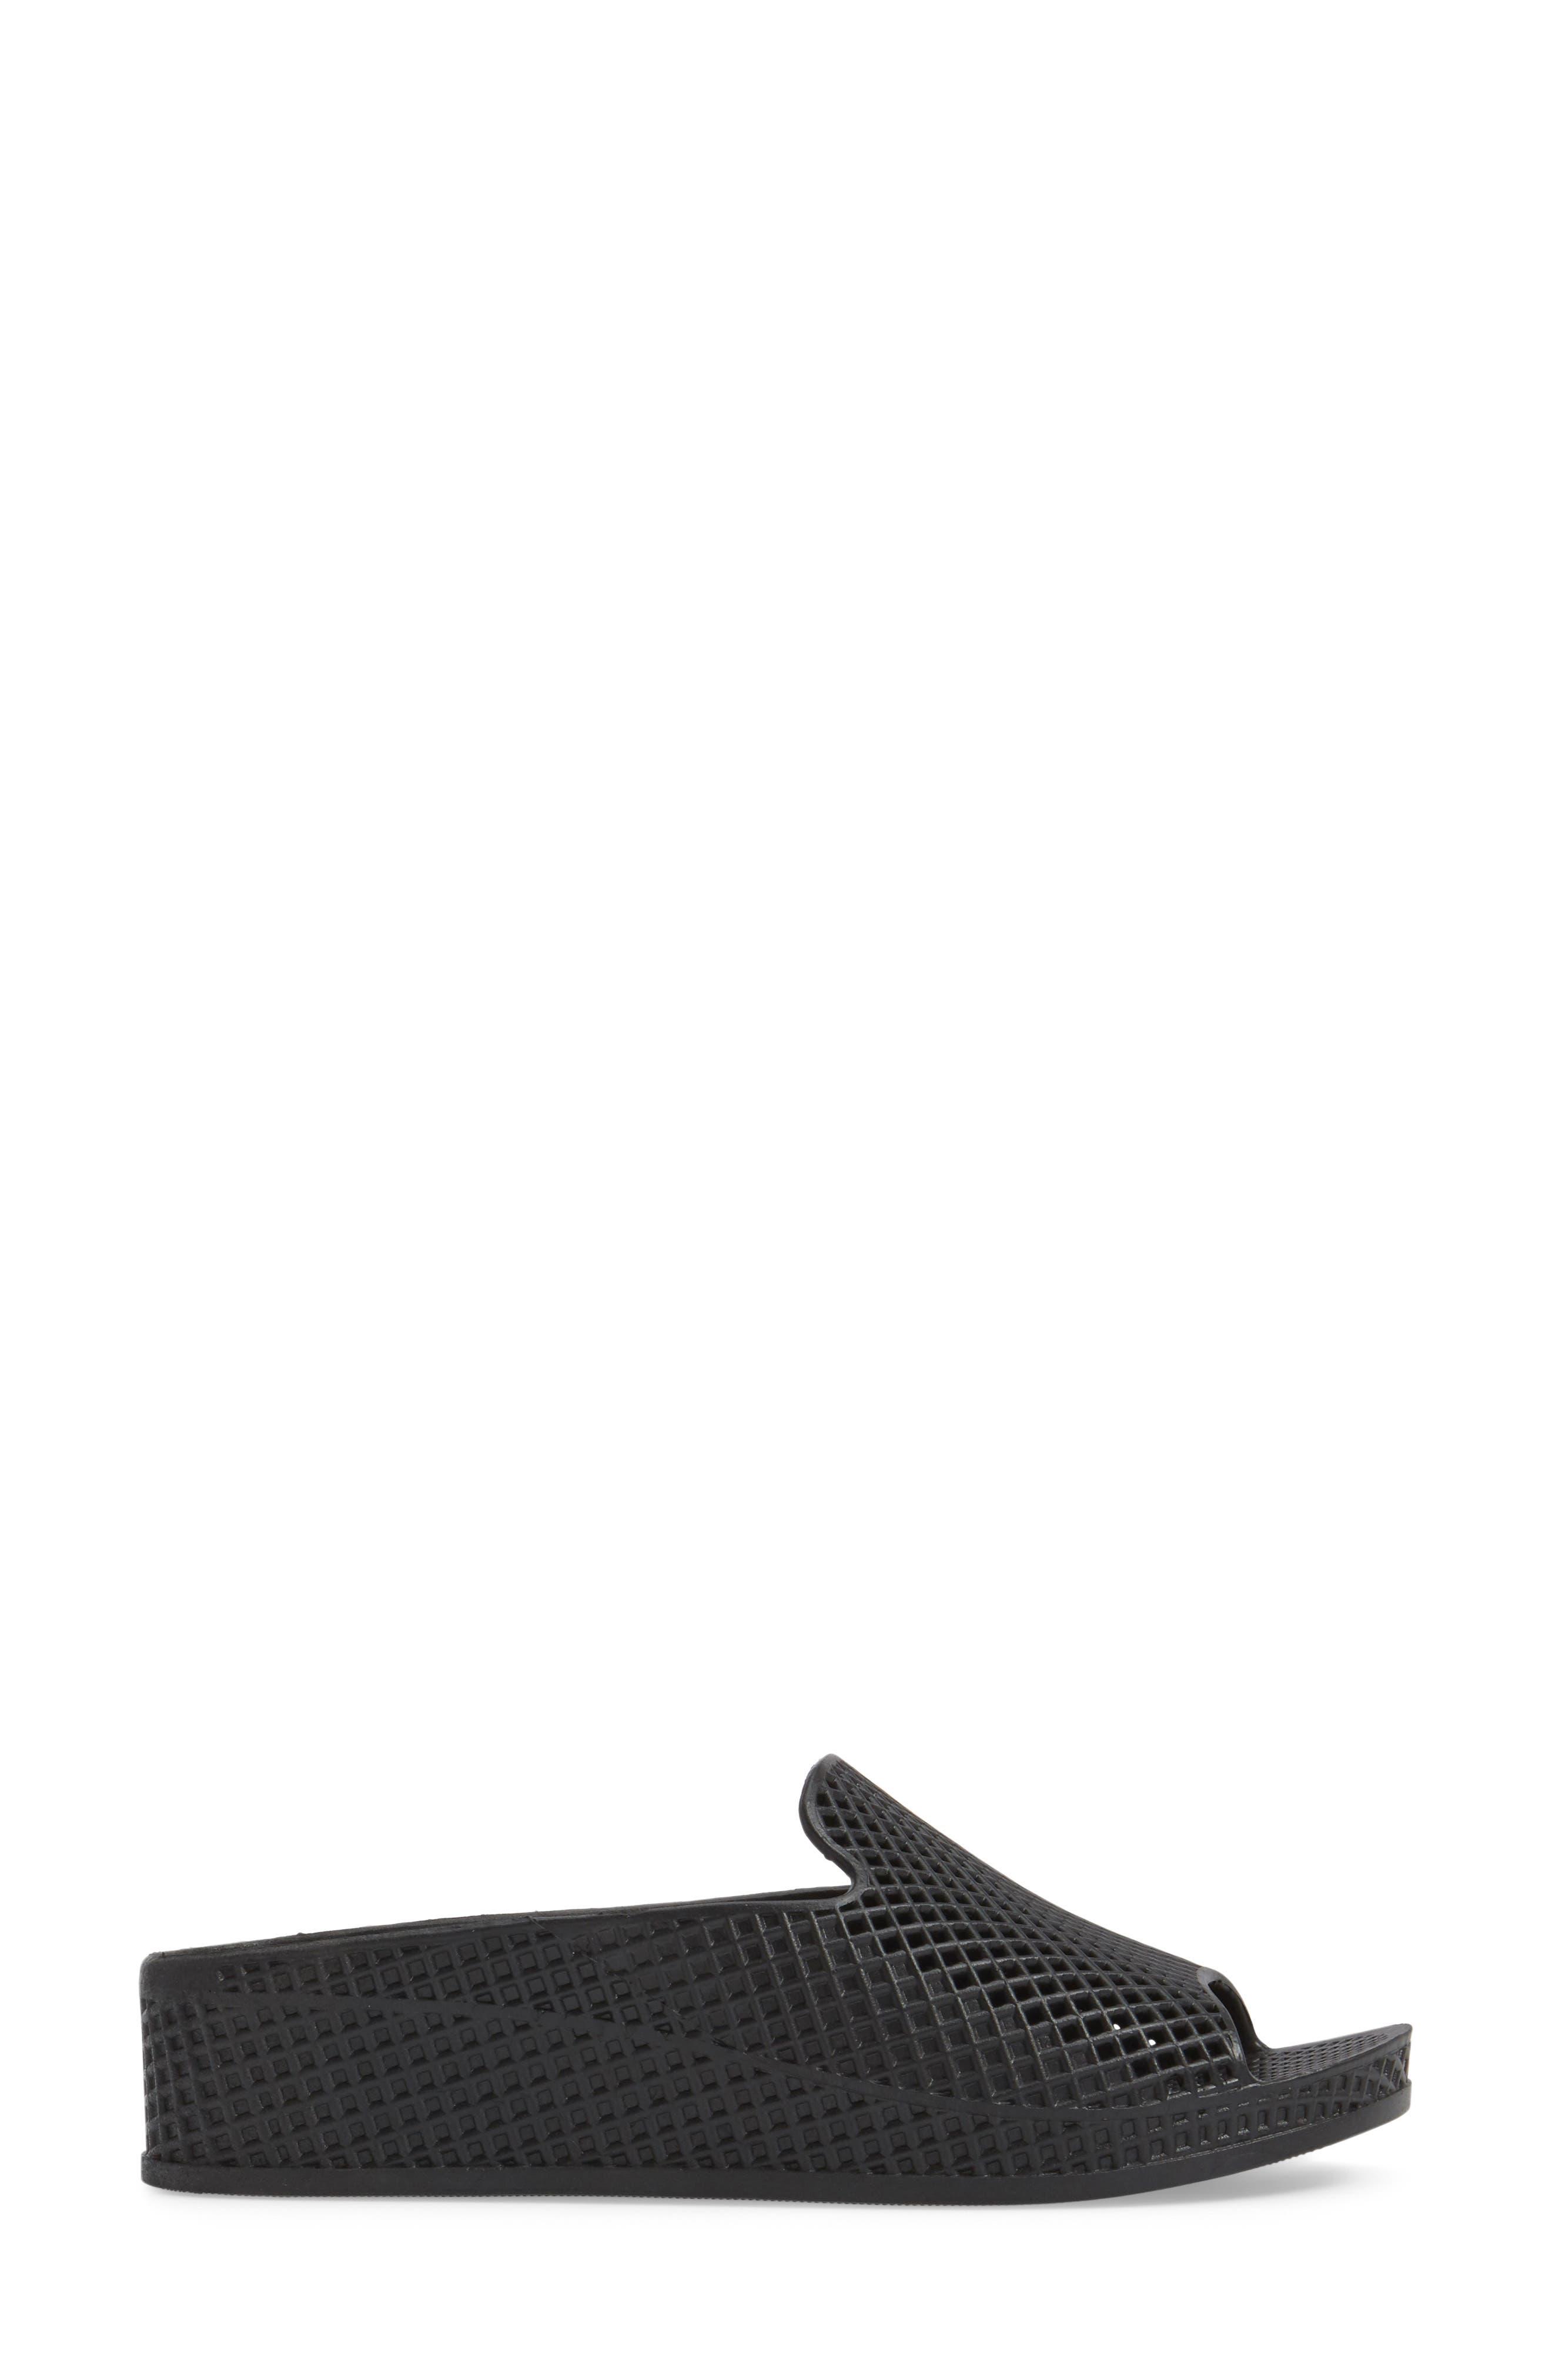 JEFFREY CAMPBELL,                             Fling 2 Sandal,                             Alternate thumbnail 3, color,                             BLACK